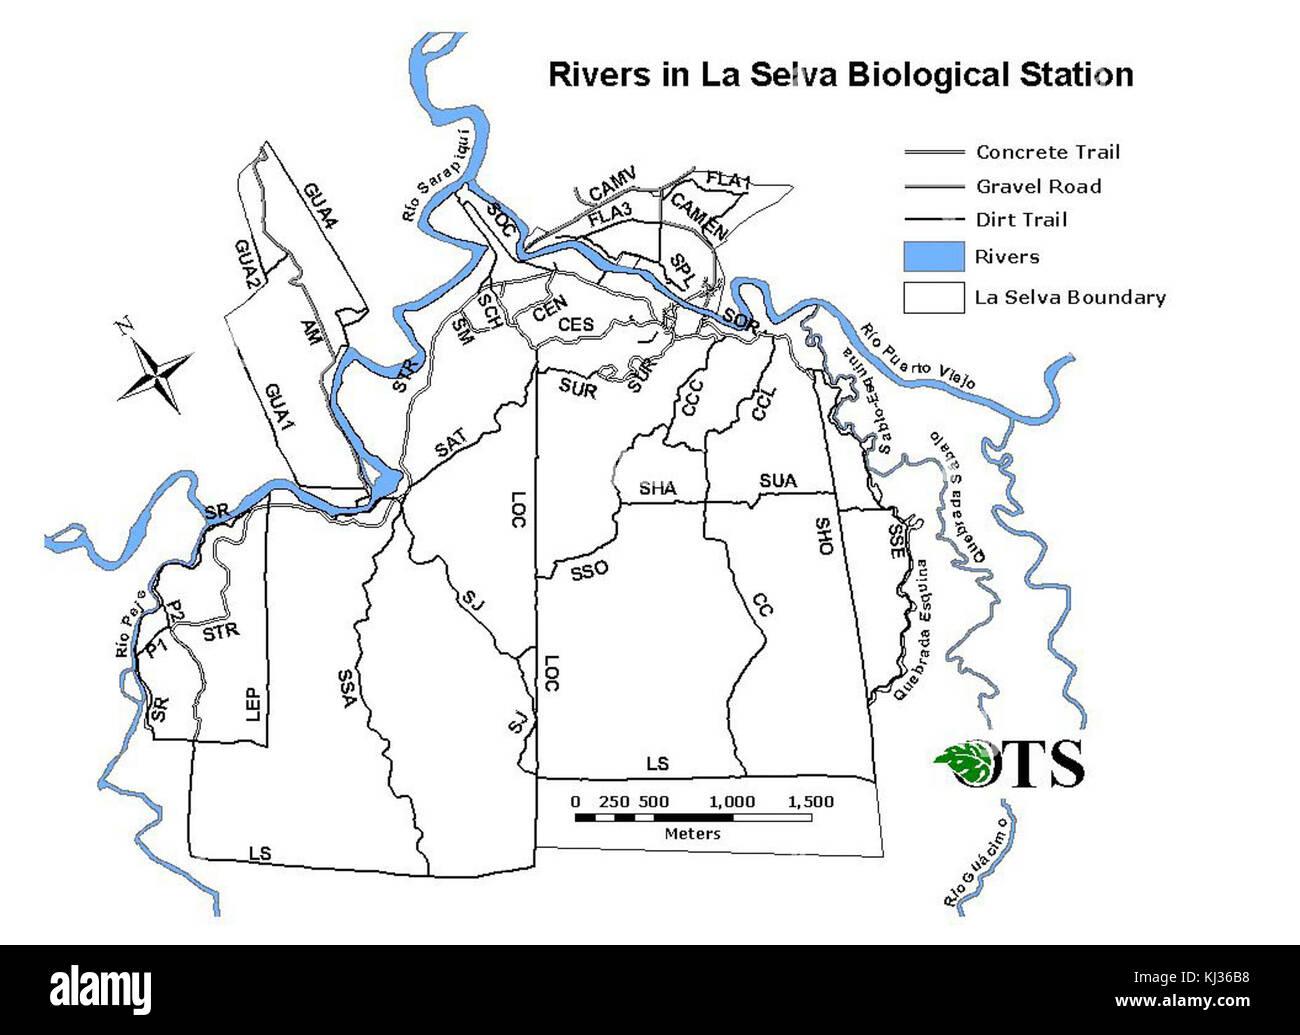 Rivers in La Selva Biological Station, Costa Rica - Stock Image